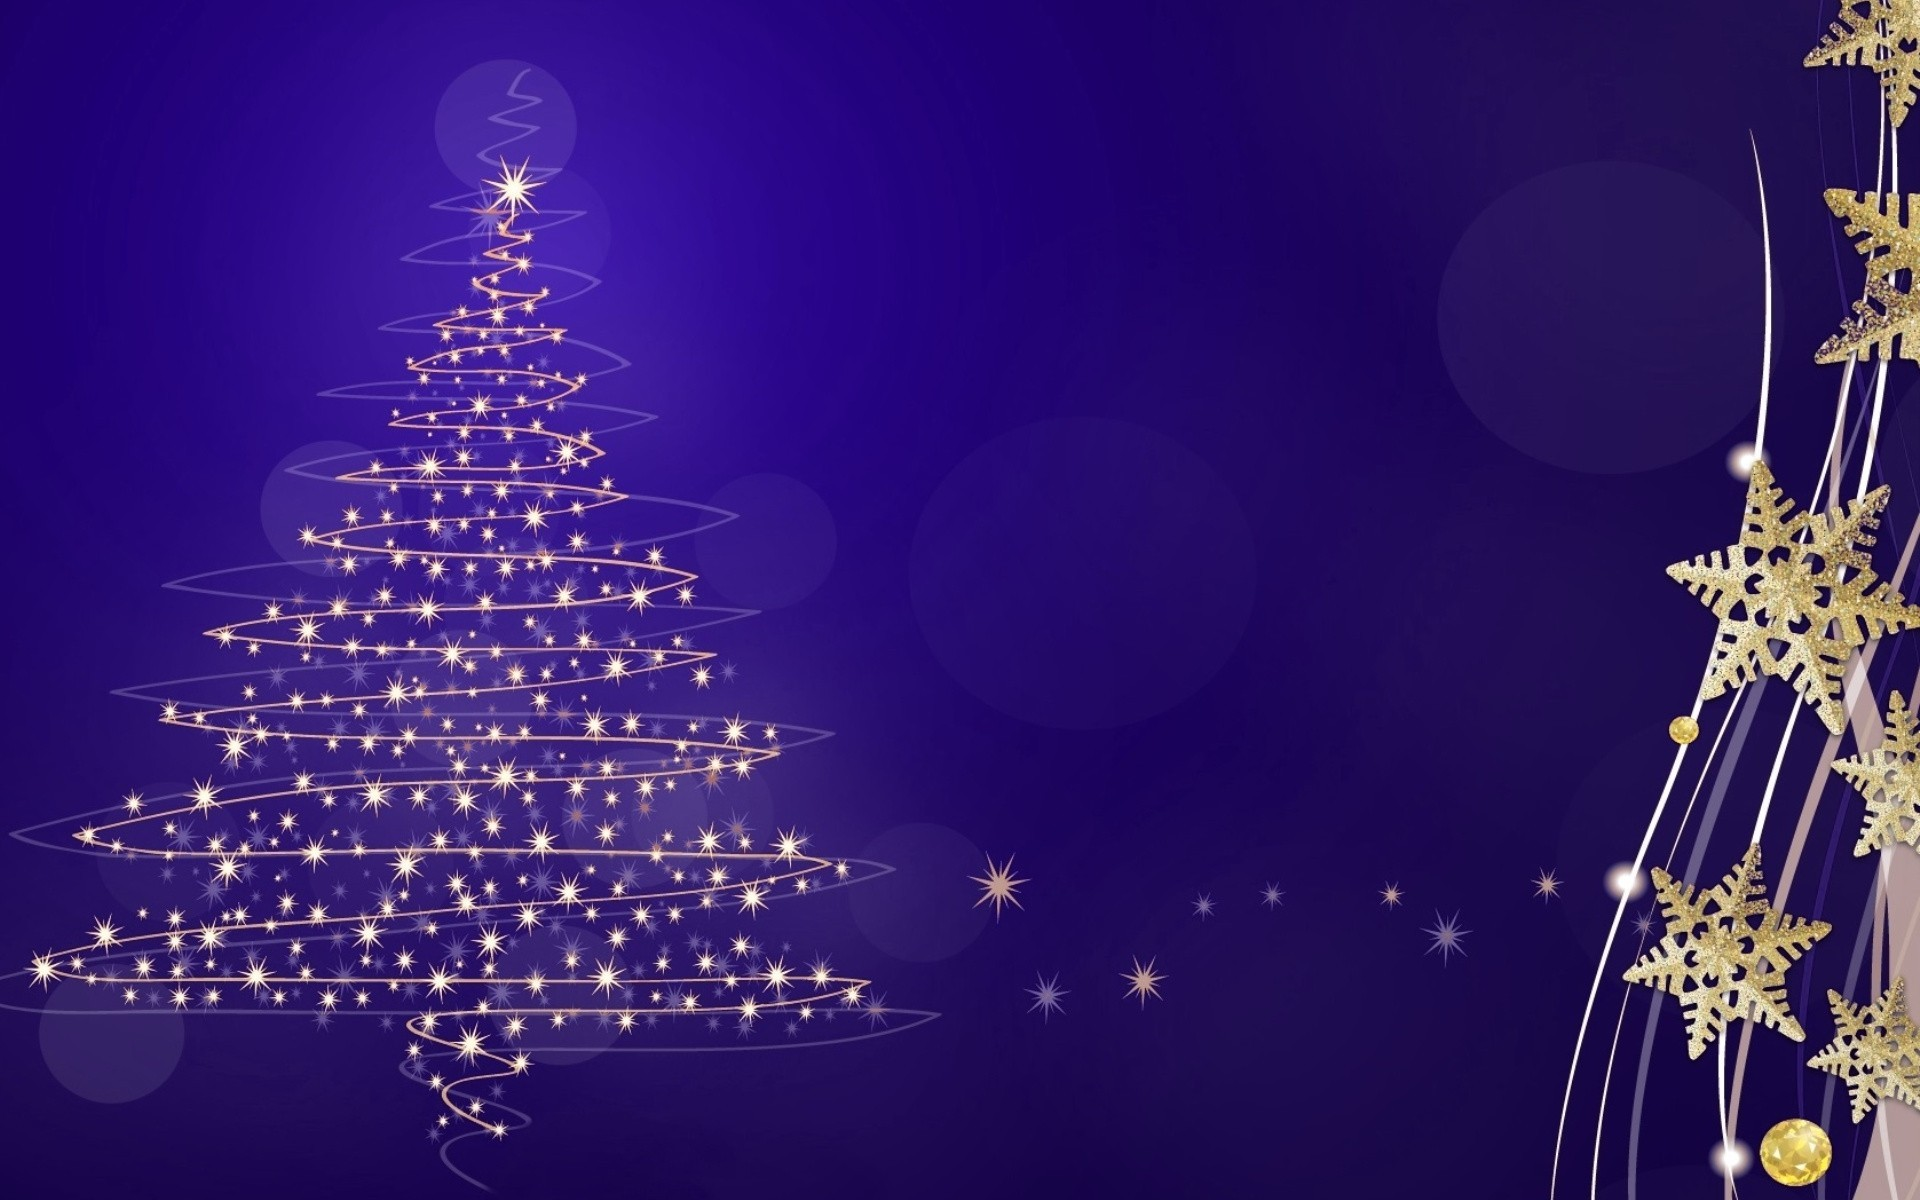 Фон в открытку новогодний, картинки